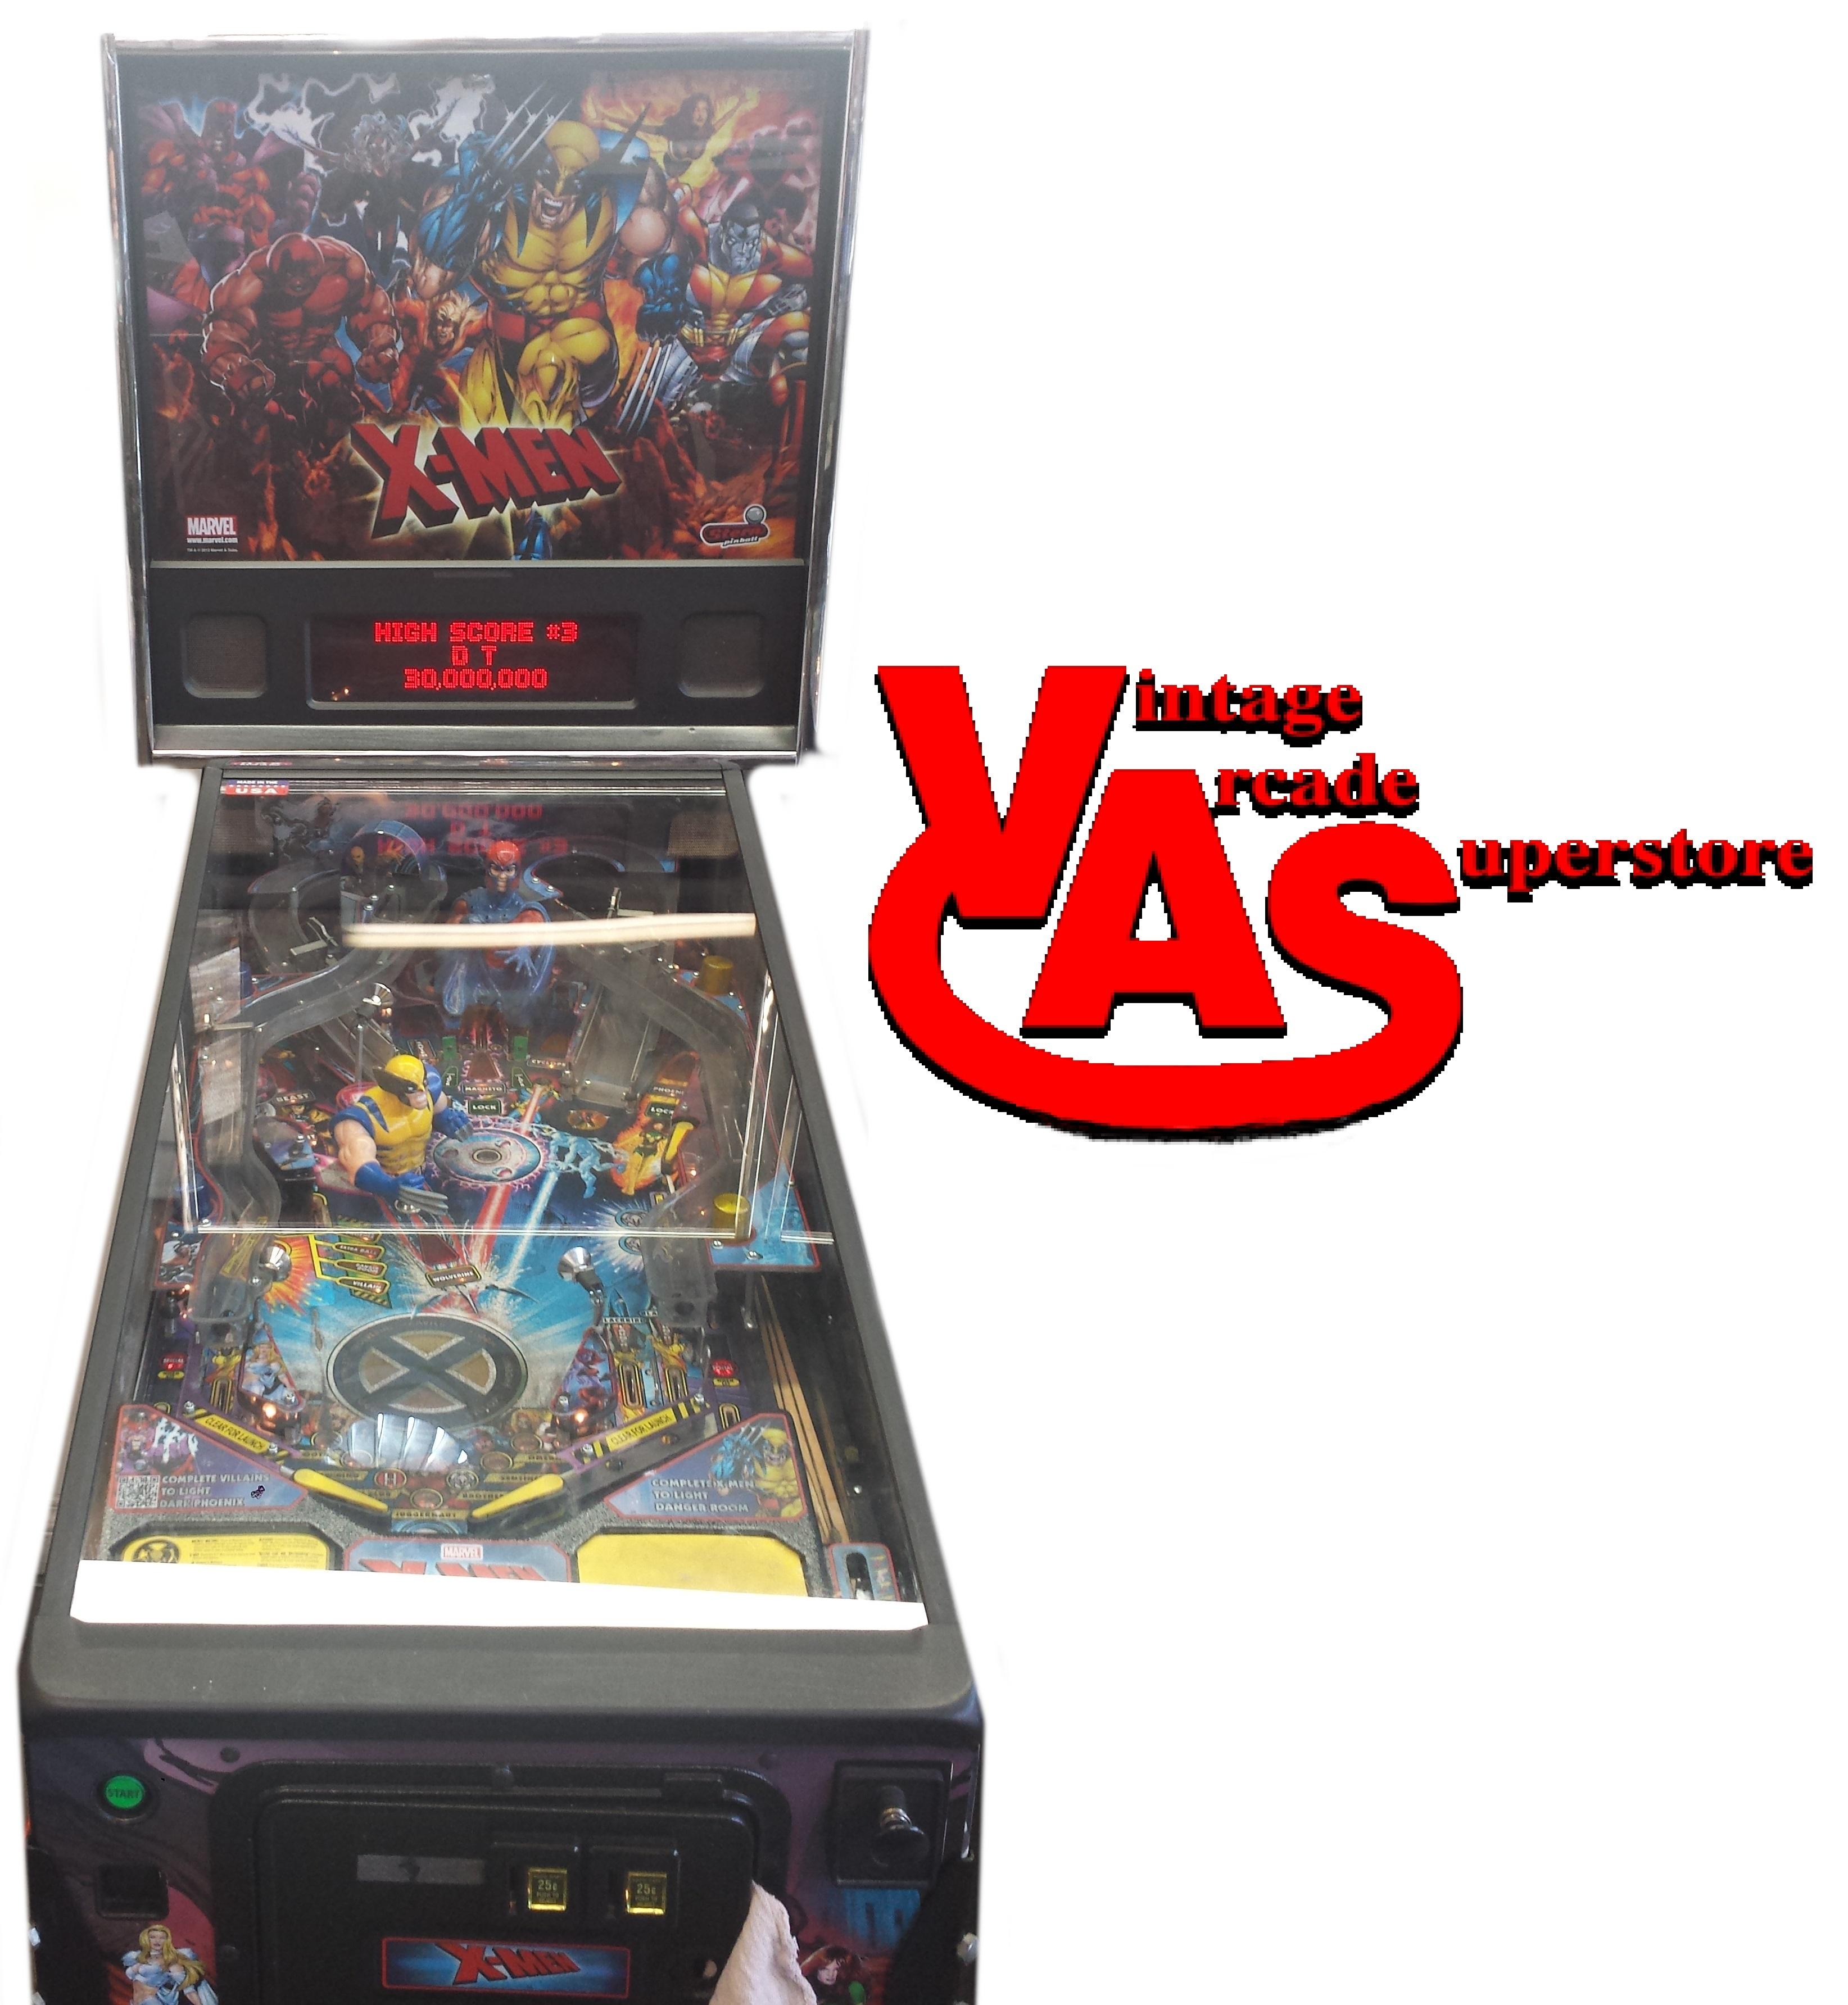 X-Men Limited Edition - Vintage Arcade Superstore